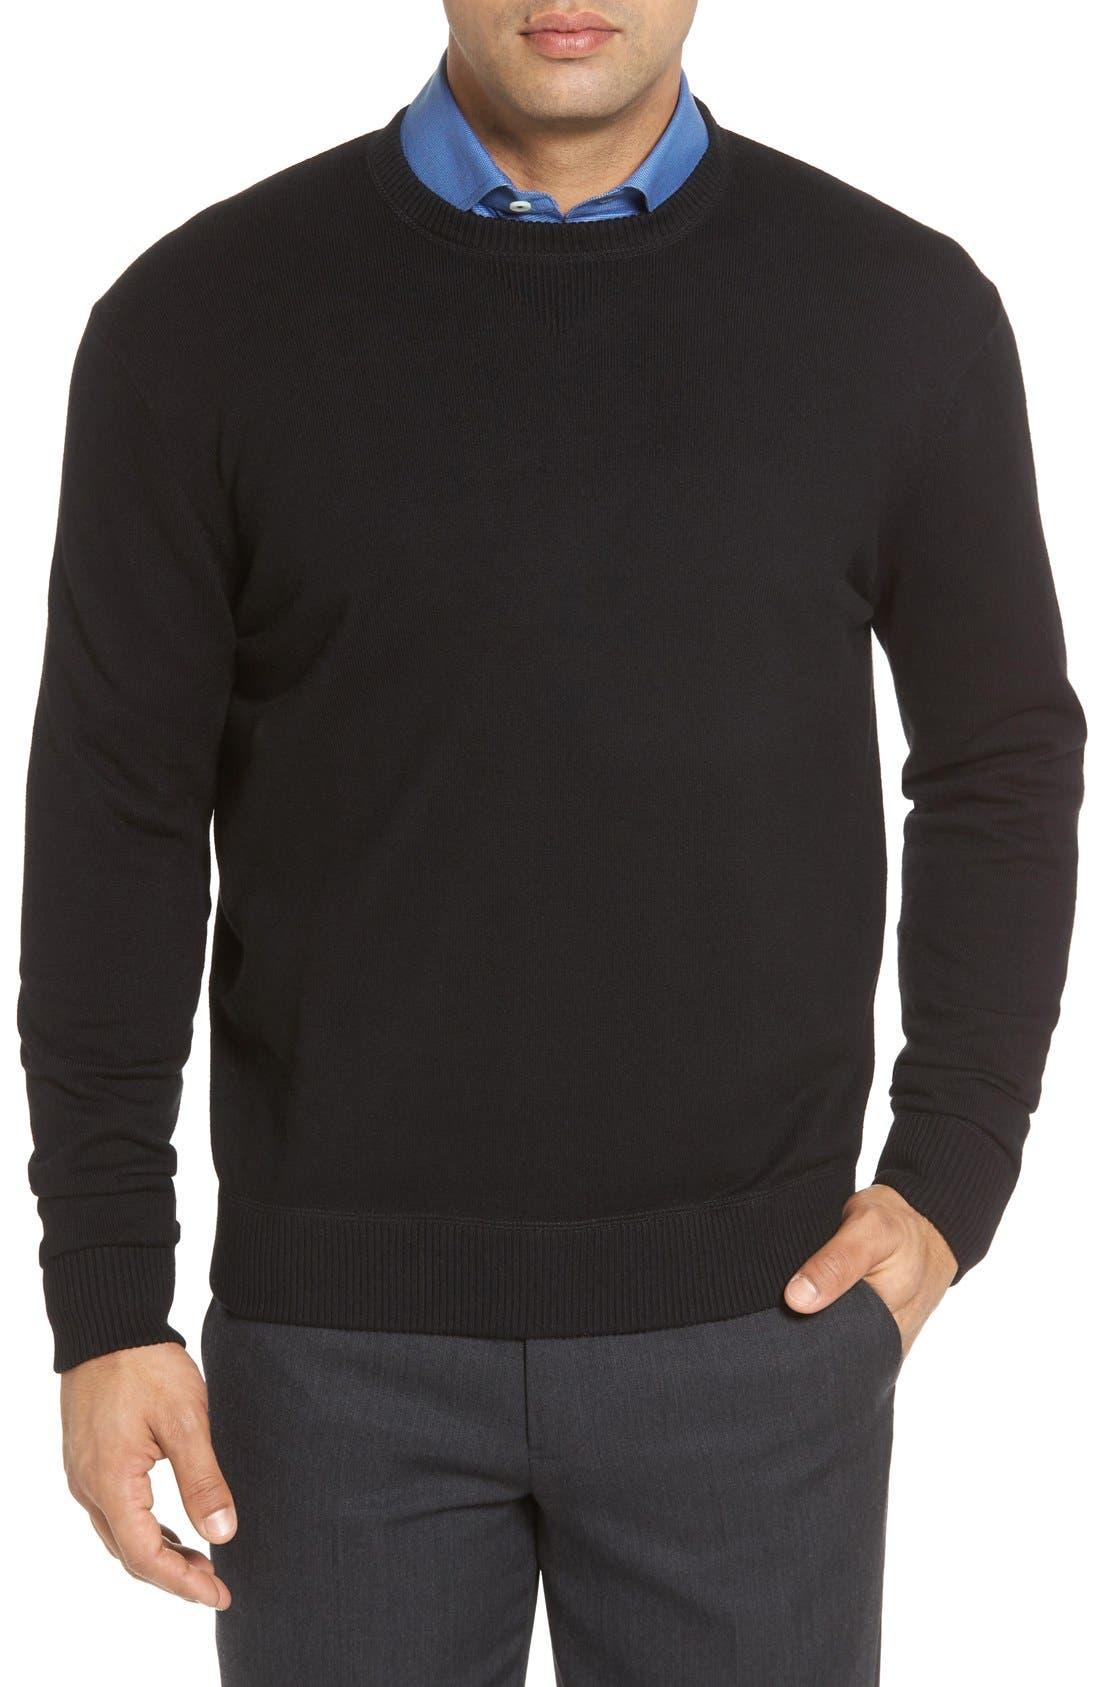 'Jersey Sport' Cotton Blend Crewneck Sweater,                             Main thumbnail 1, color,                             001